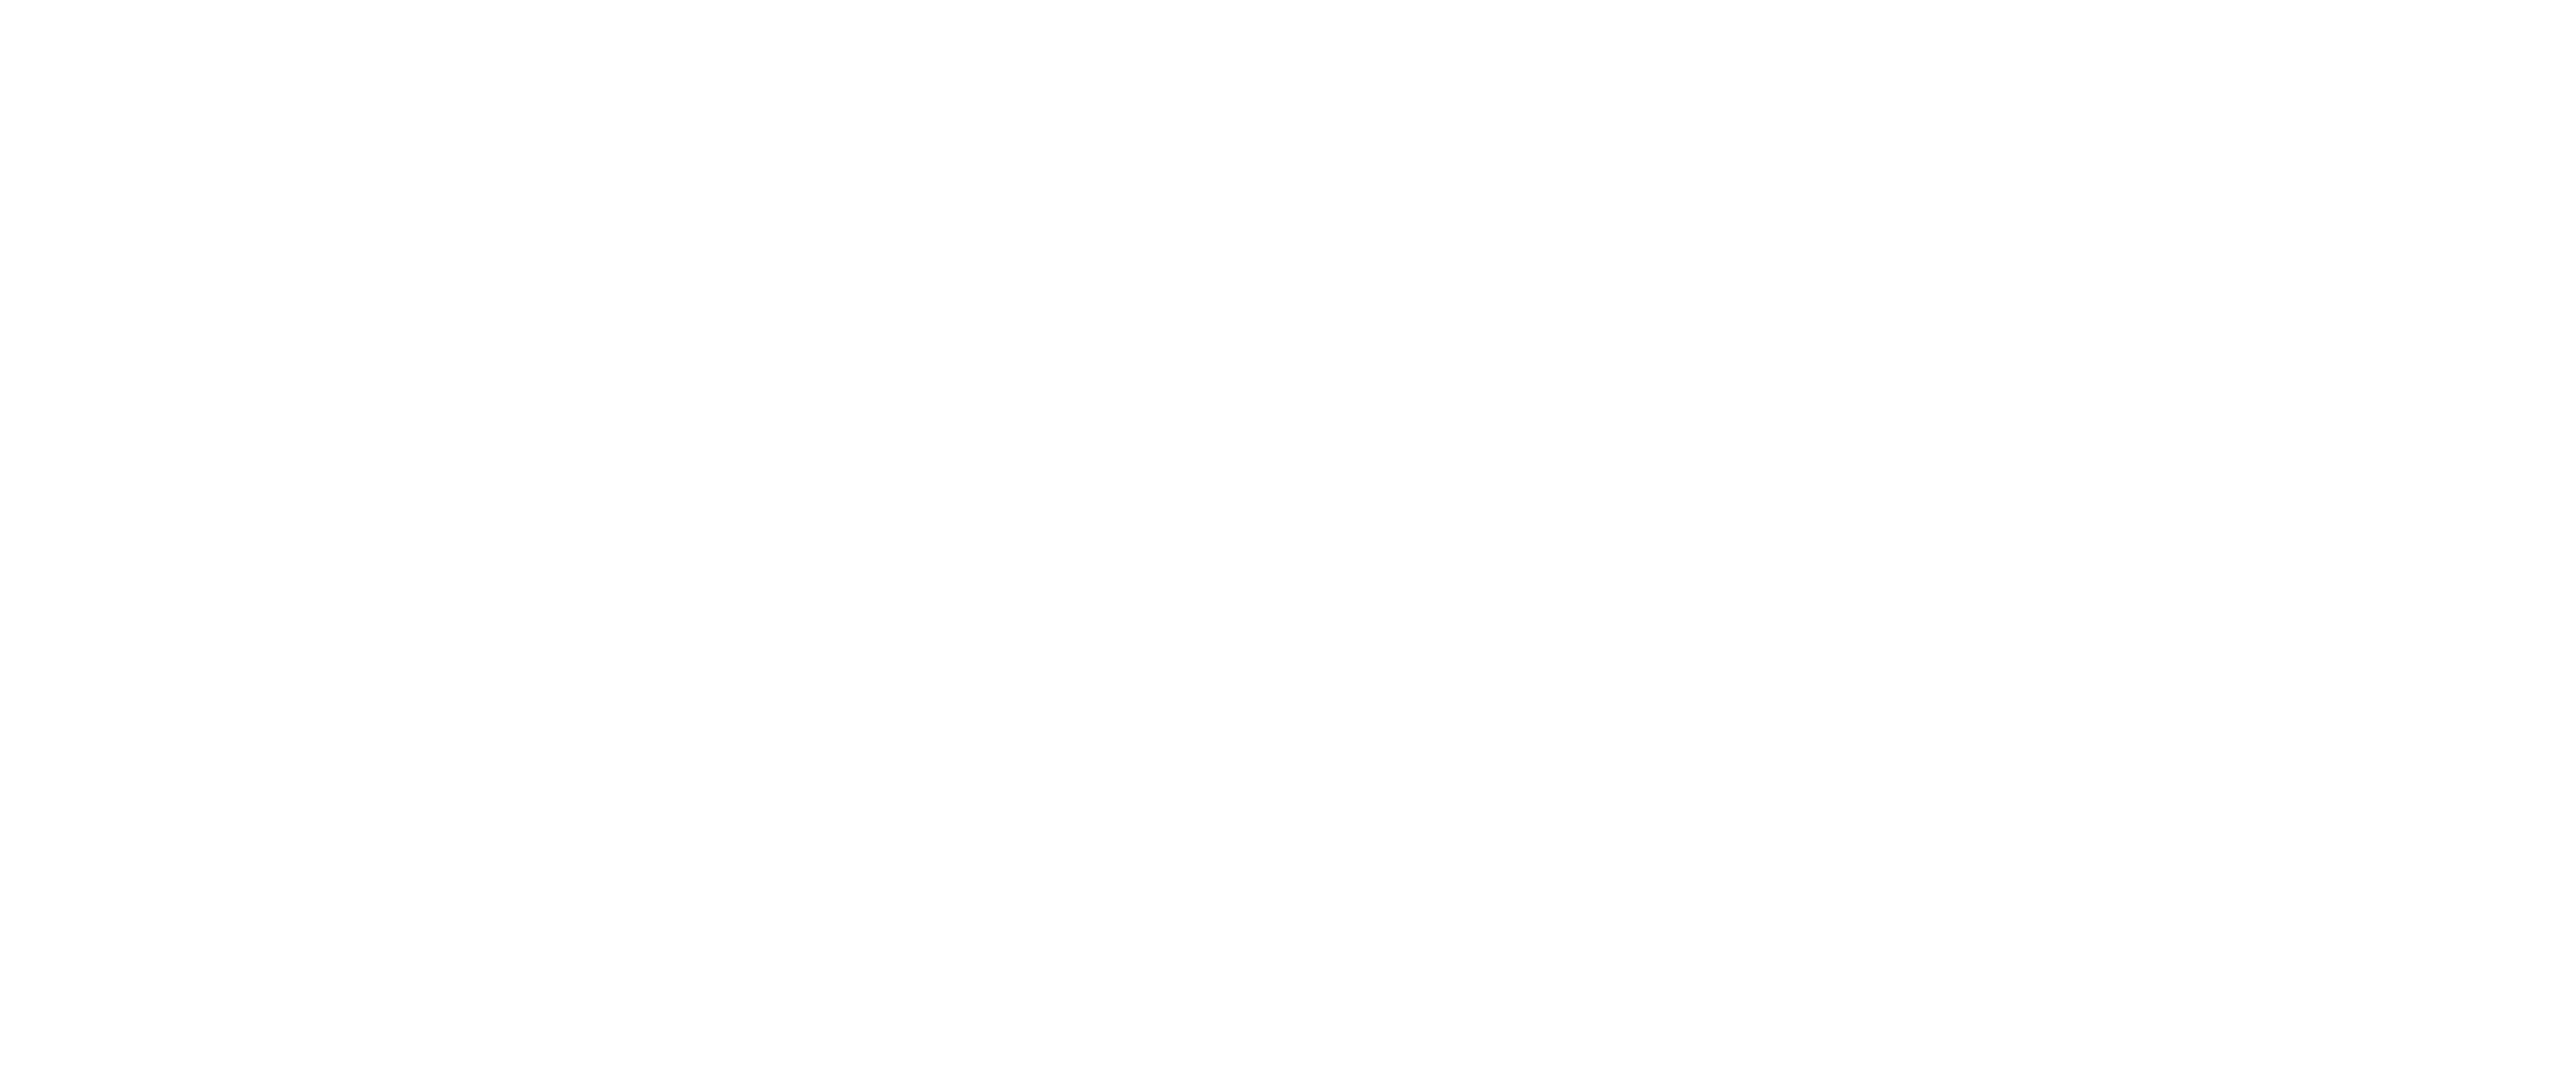 Lace clipart silhouette. Ornament style transparent png